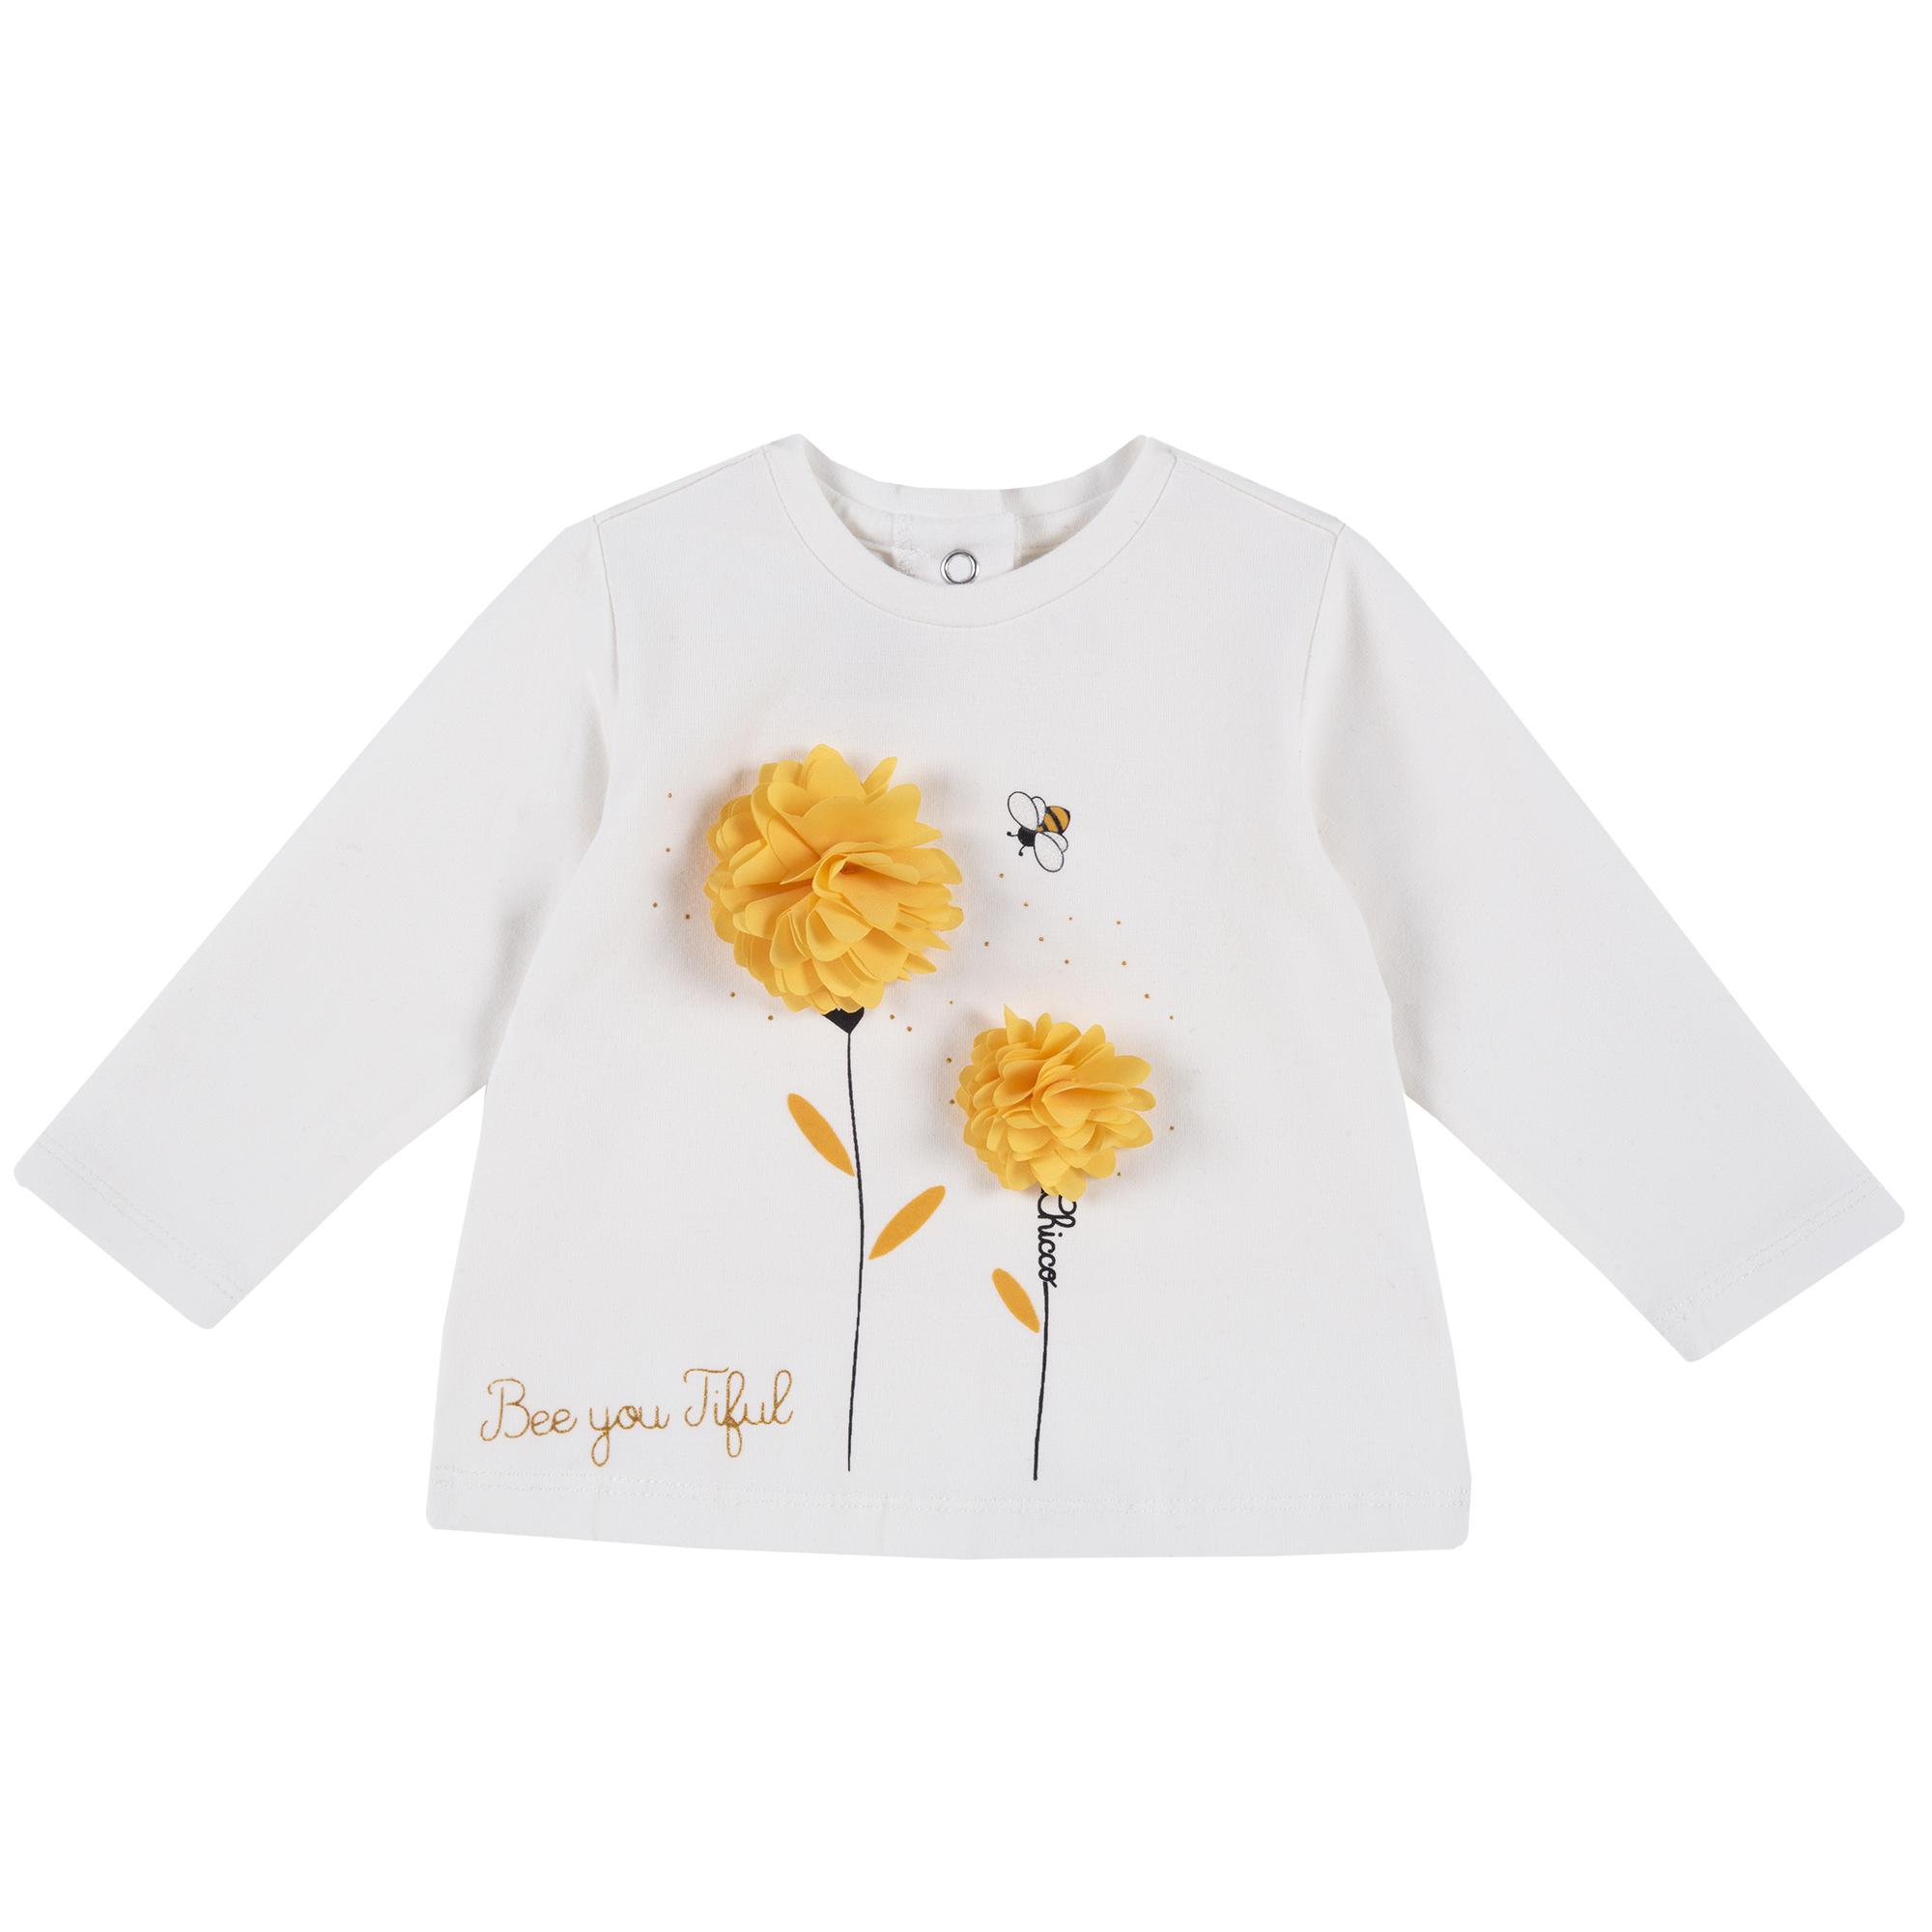 Bluza Copii Chicco, Alb Cu Model Floral, 47385 imagine